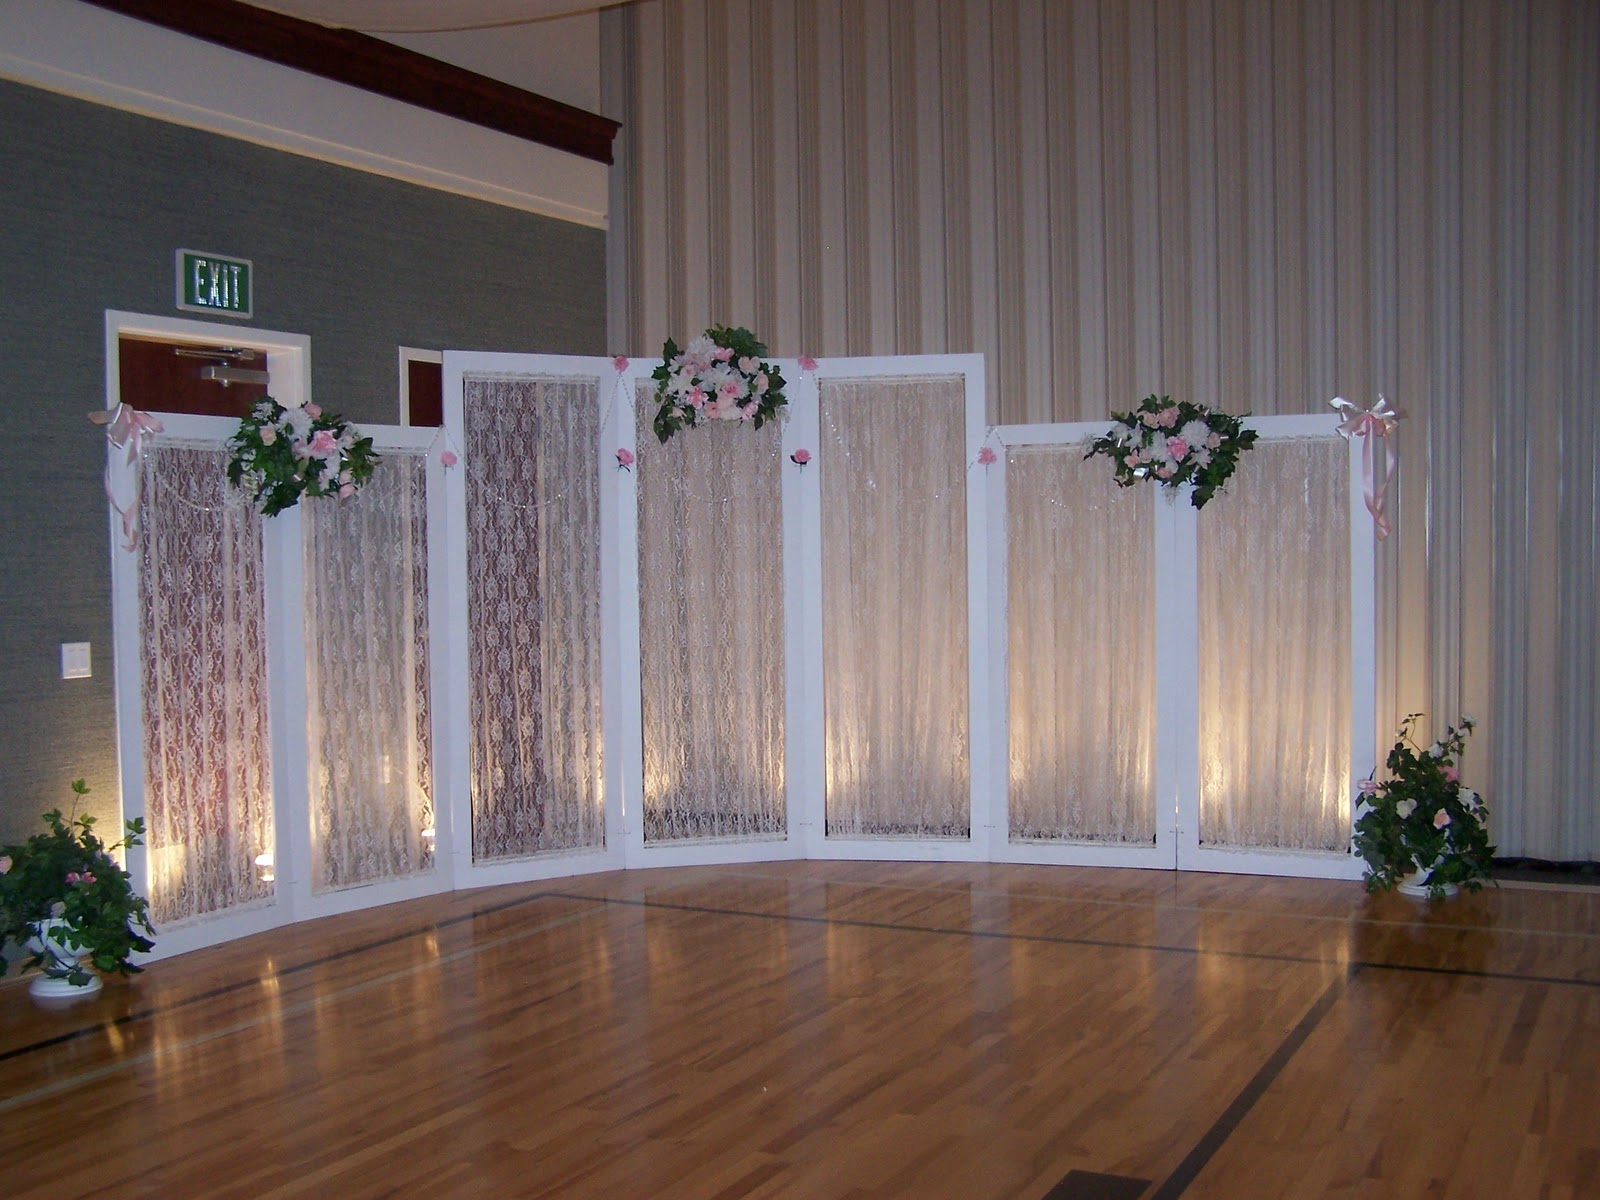 Creative wedding and party decor backdrop choices - Wedding wall decoration ideas ...